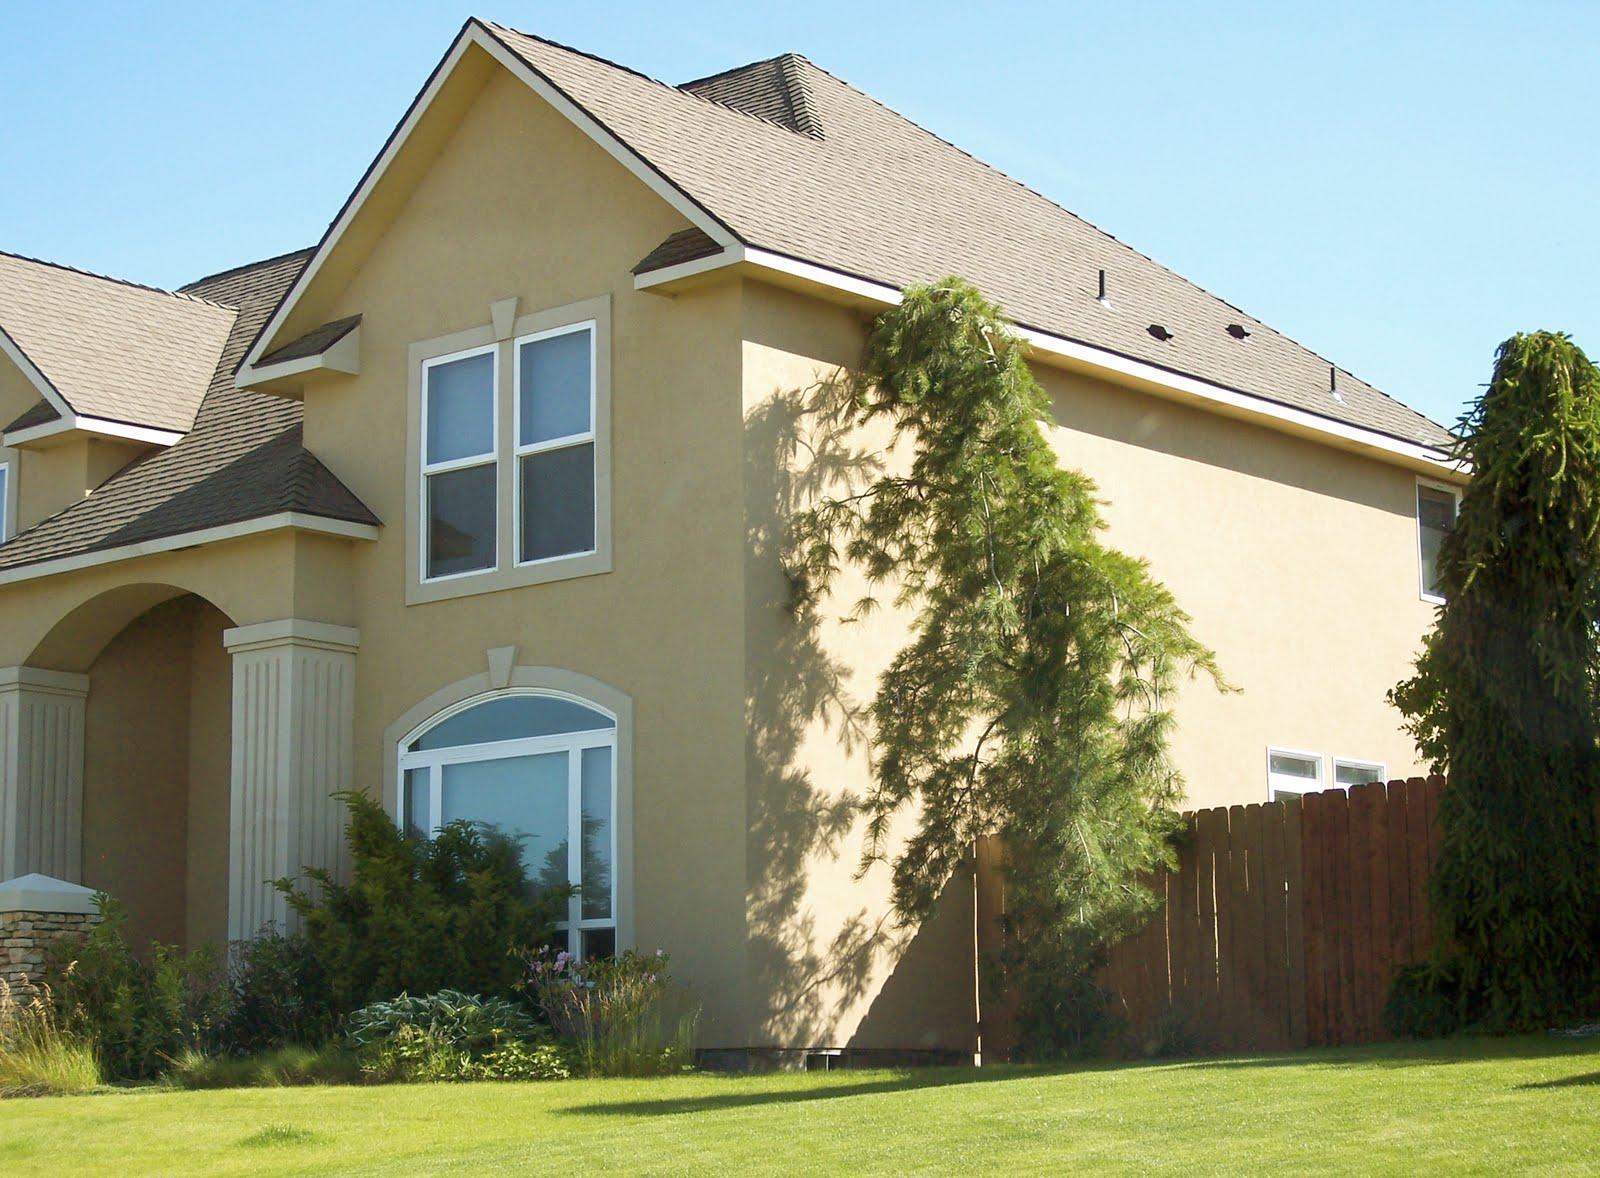 Building A Home: Deciding On The Color Scheme For The Exterior